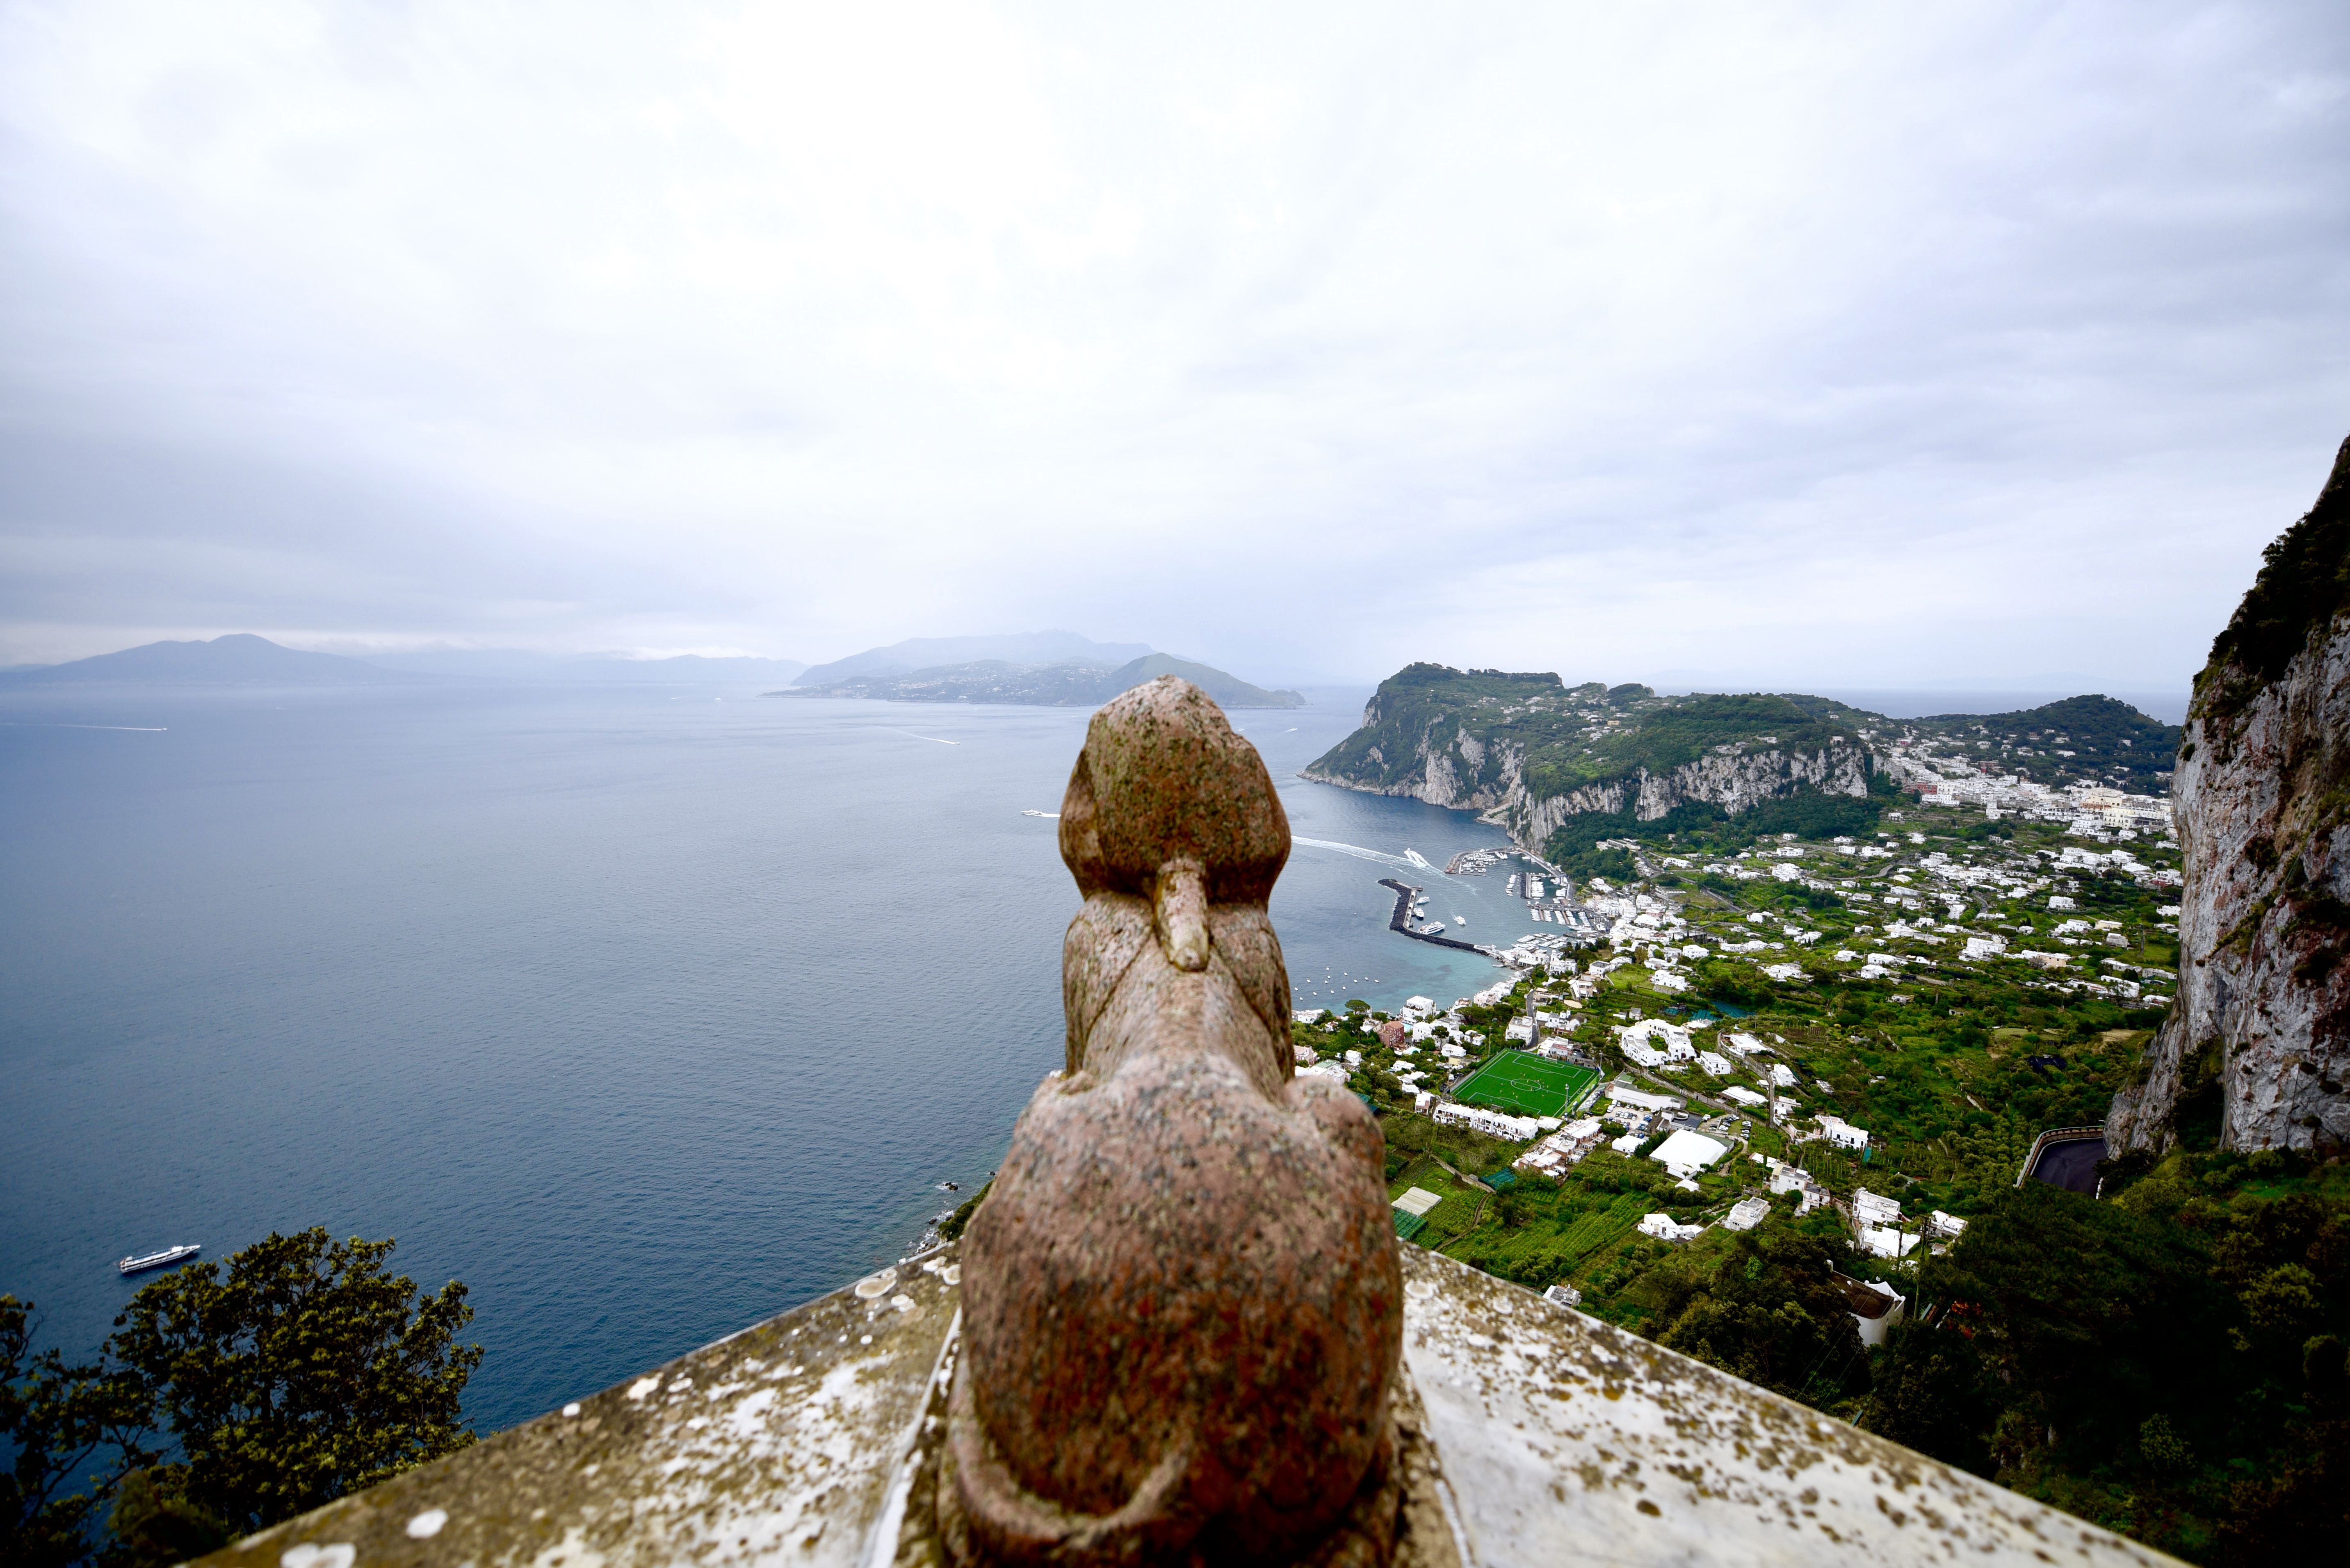 Villa San Michele Capri Sphinx Amalfi Coast Anacapri Italy DNXB dongnanxibei